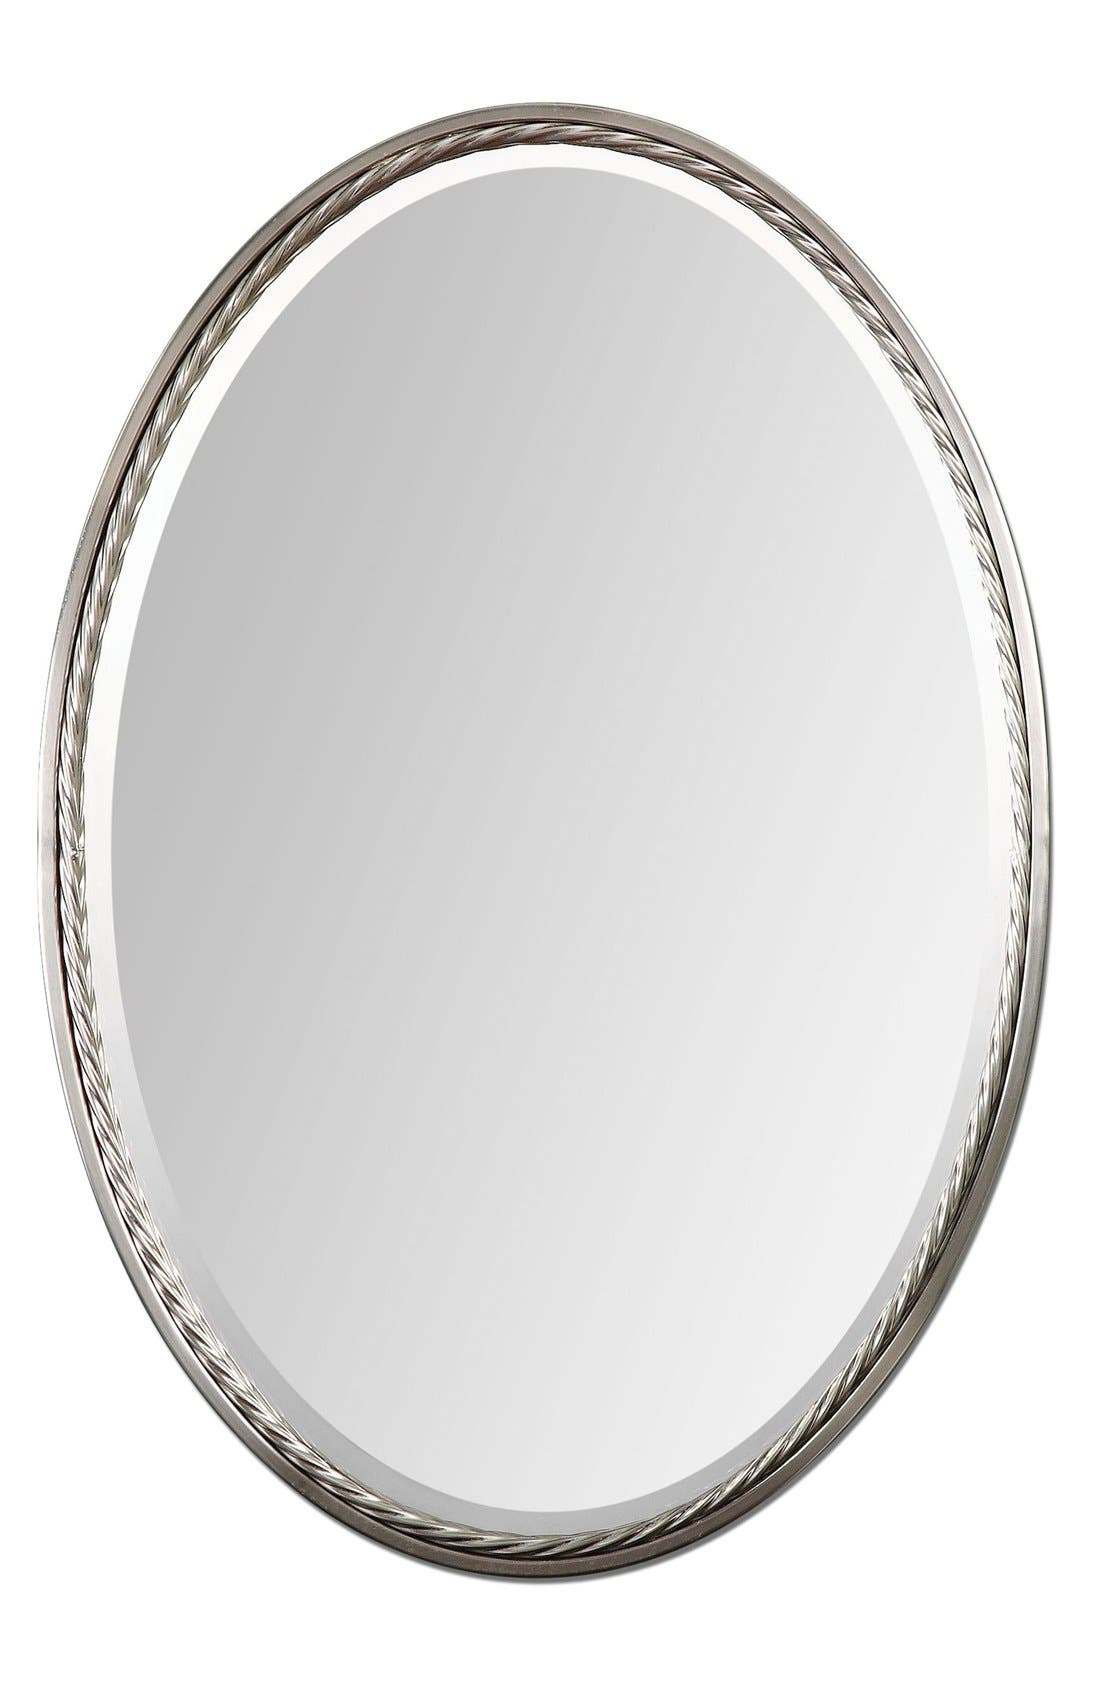 Main Image - Uttermost 'Casalina' Oval Mirror